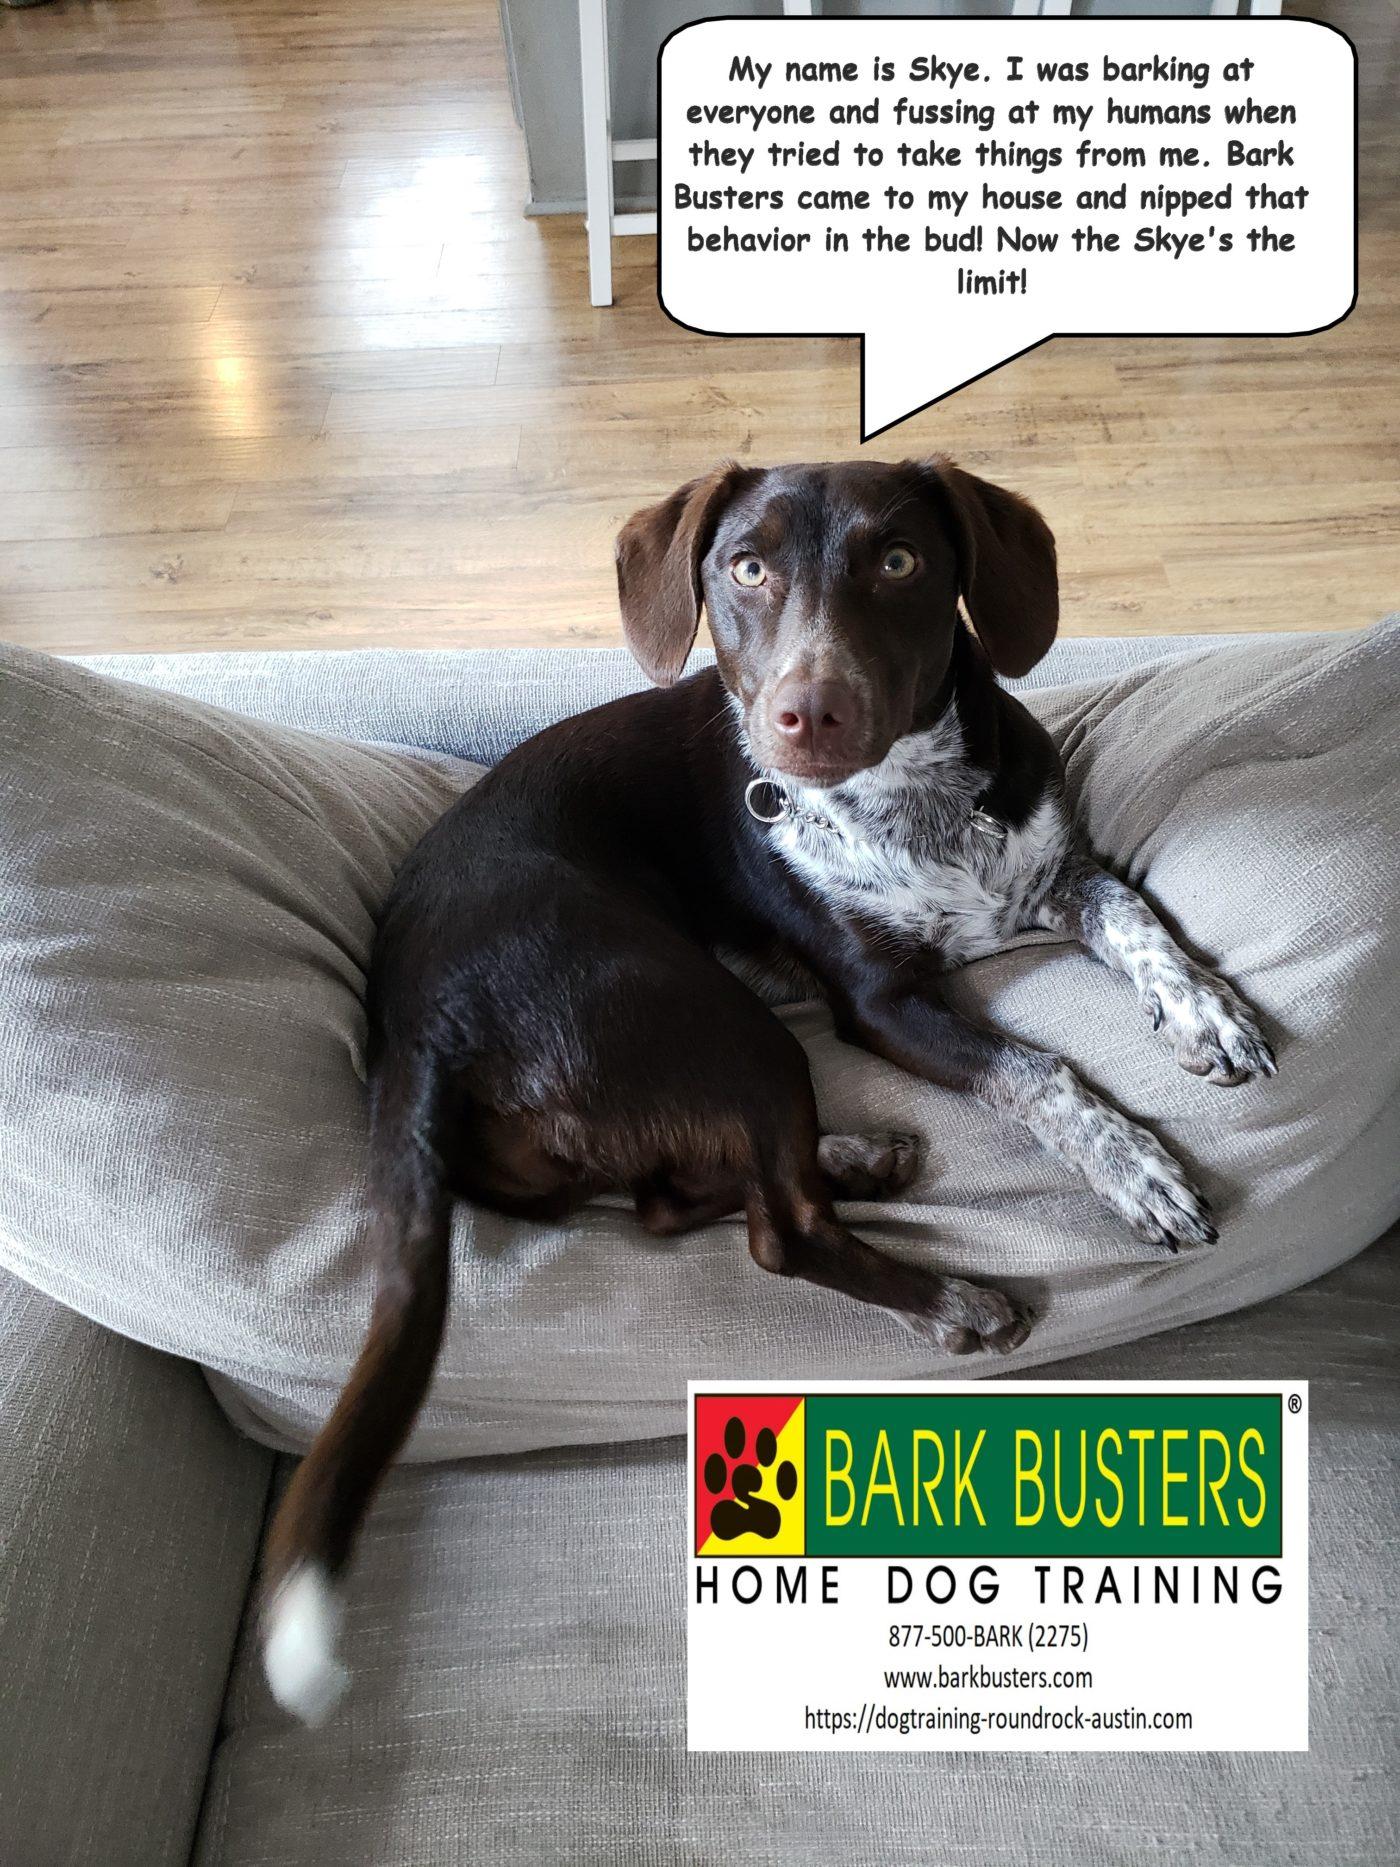 #mixeddogtraining #dogsofbarkbusters #dogtrainingeastaustin #bestdogtrainingroundrock